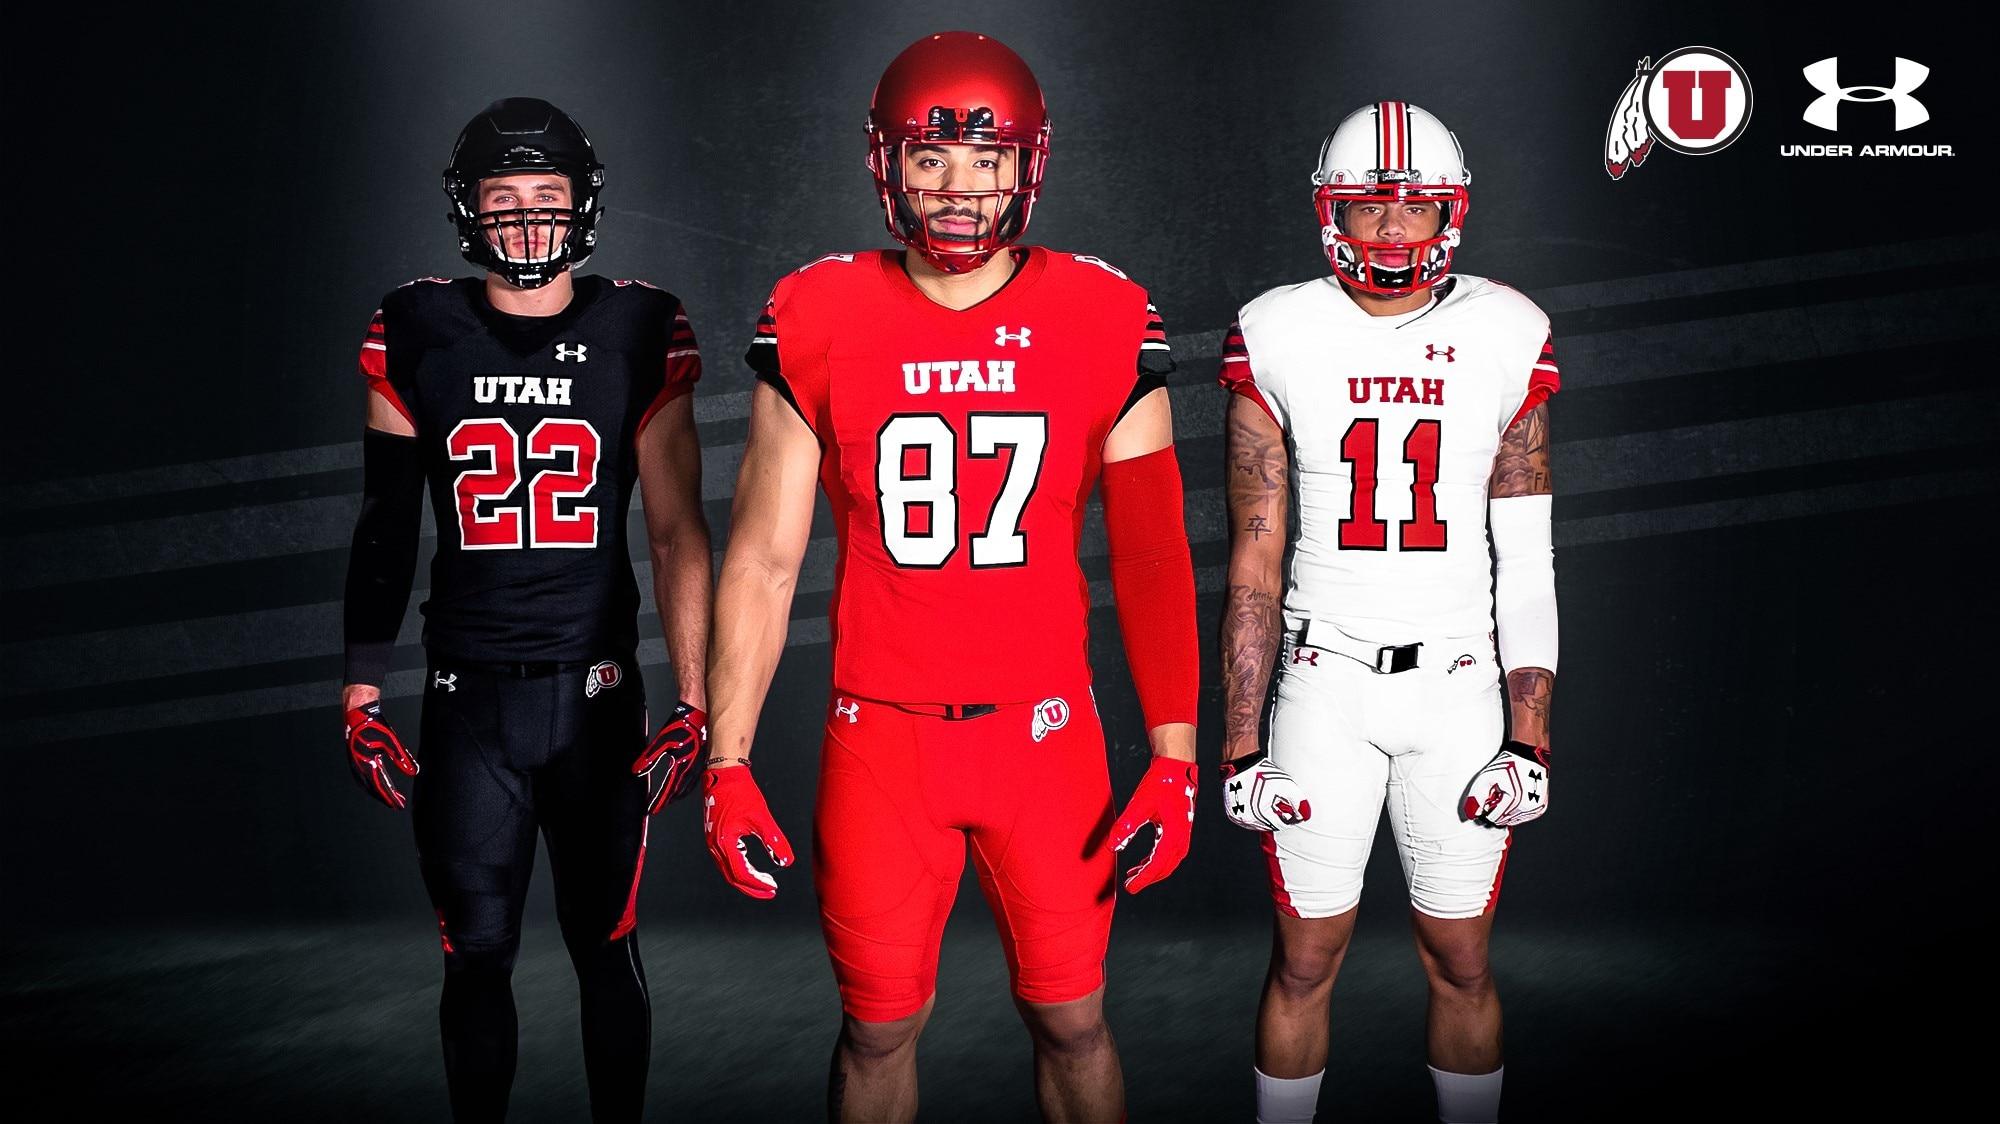 Utah unveils new uniforms ahead of 2017 season  470bc9c12